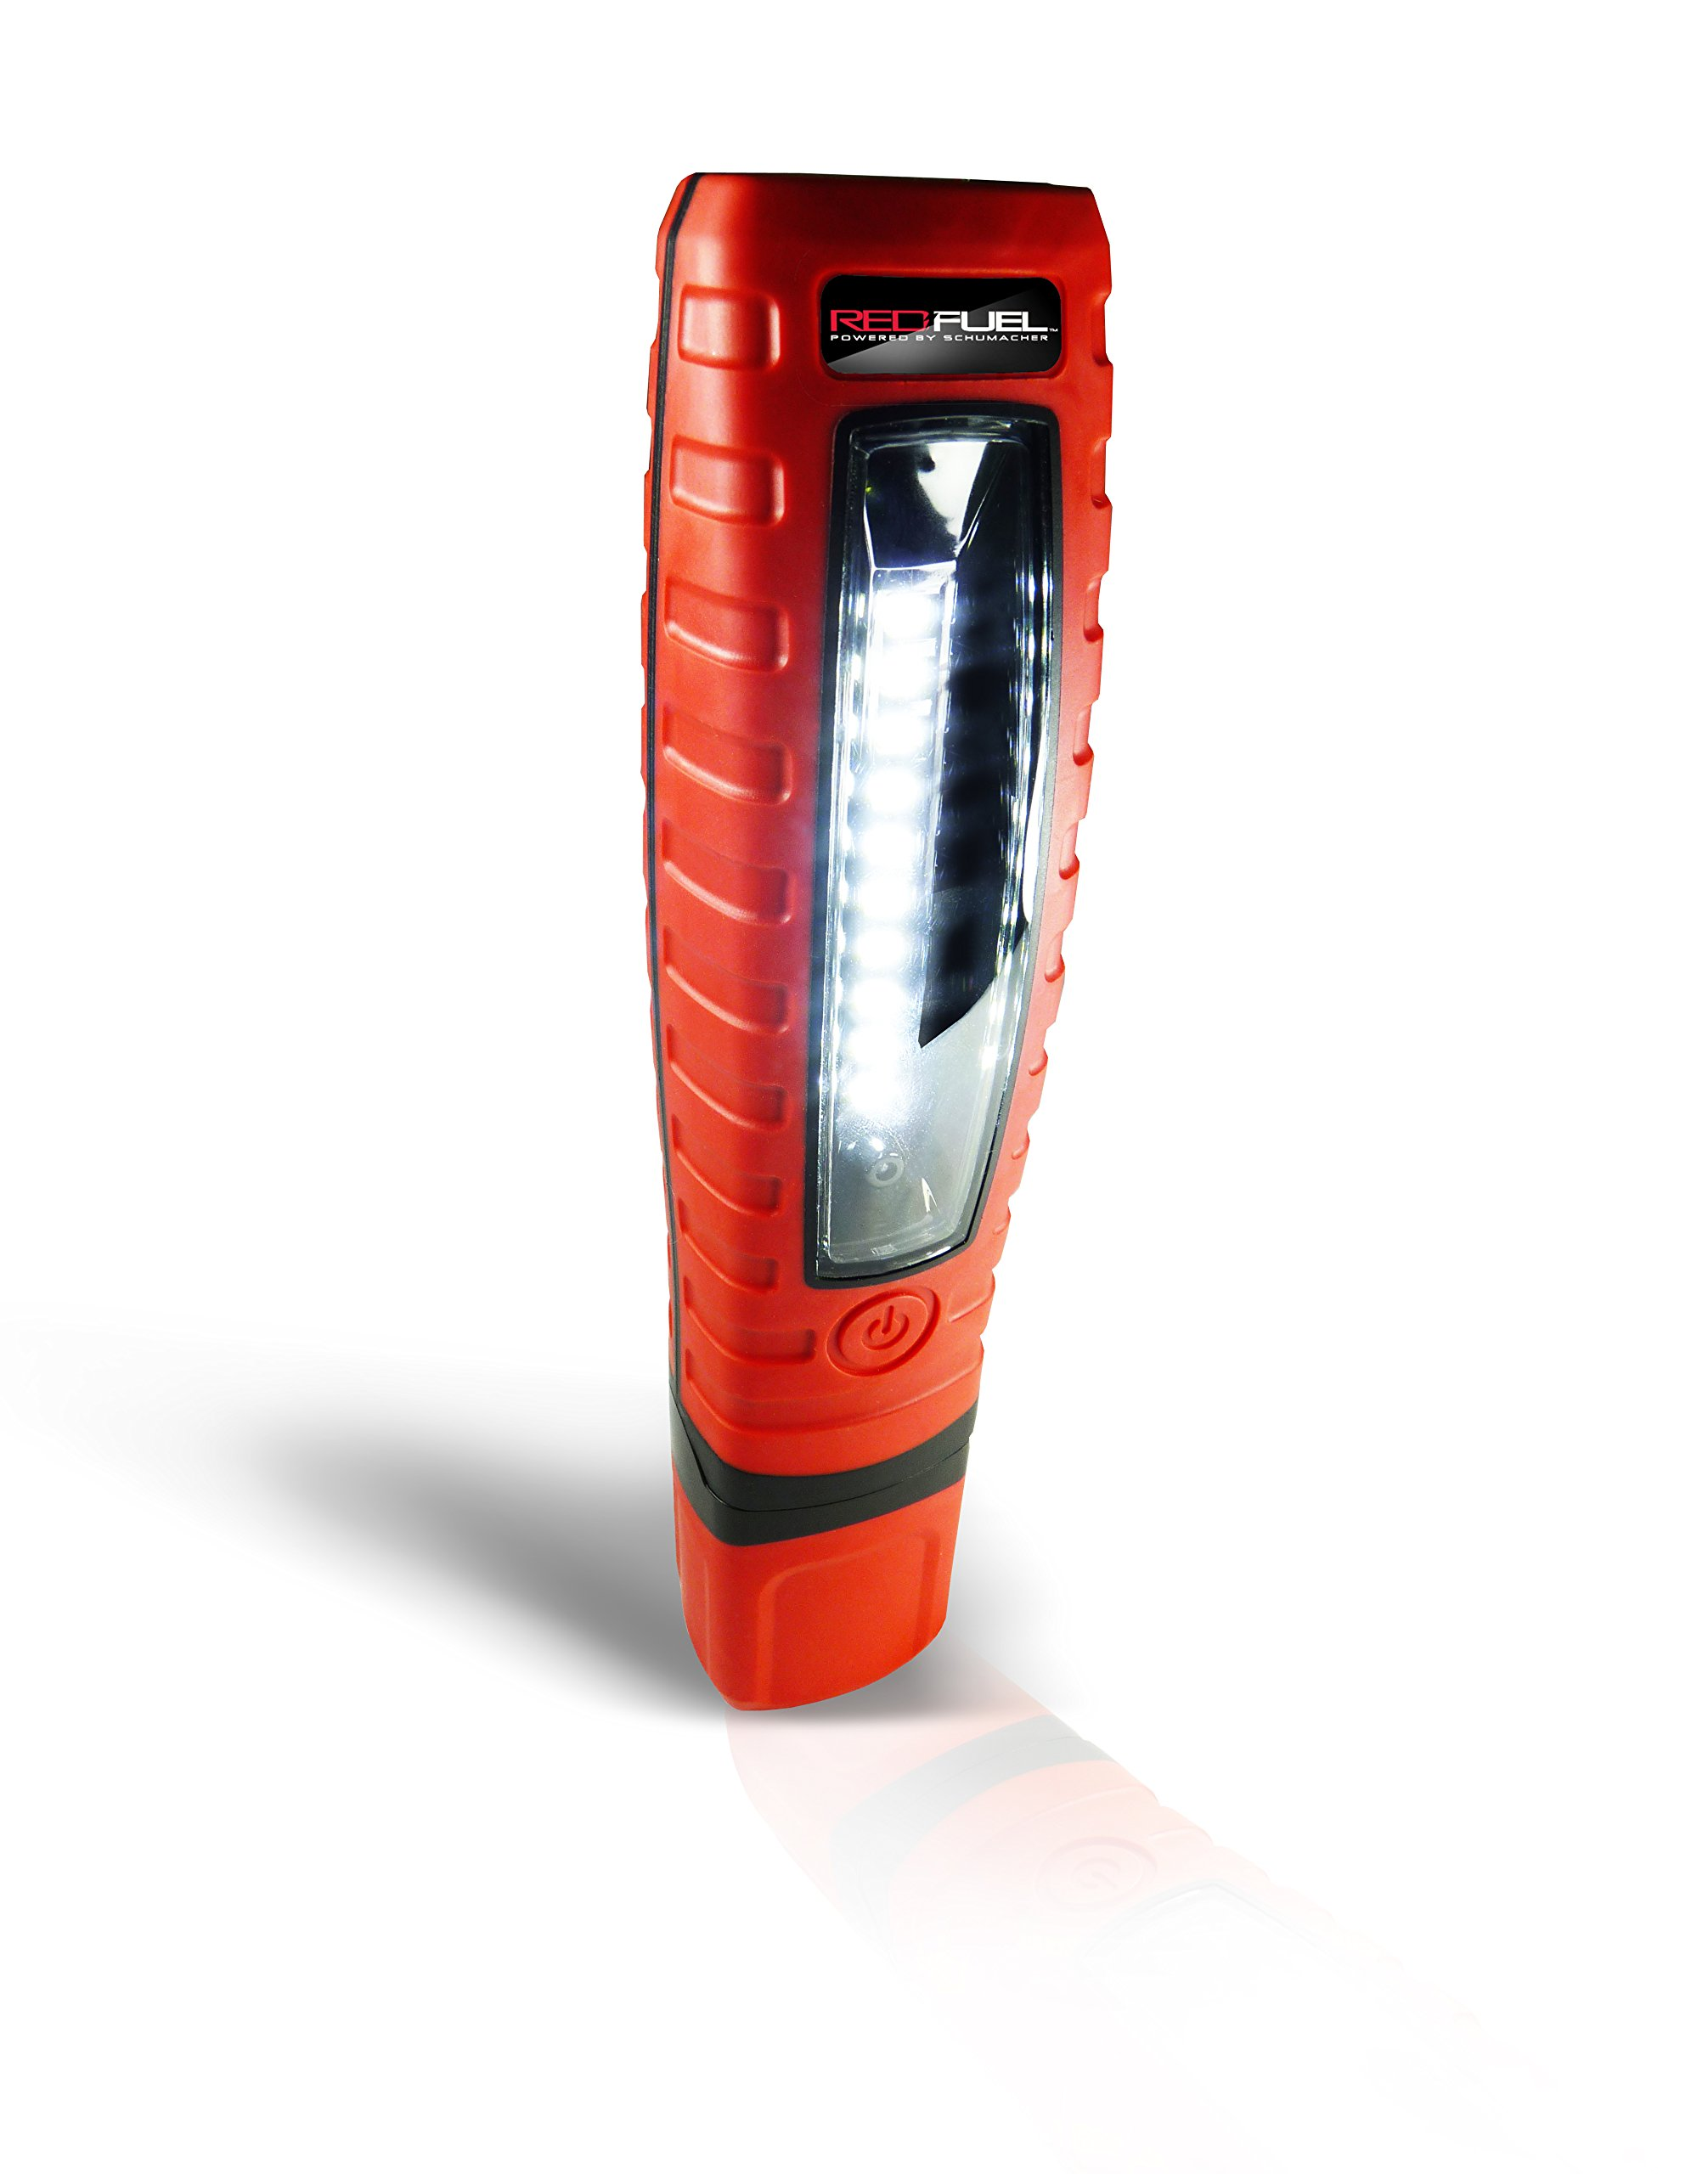 Schumacher SL360R LED Cordless Work Light